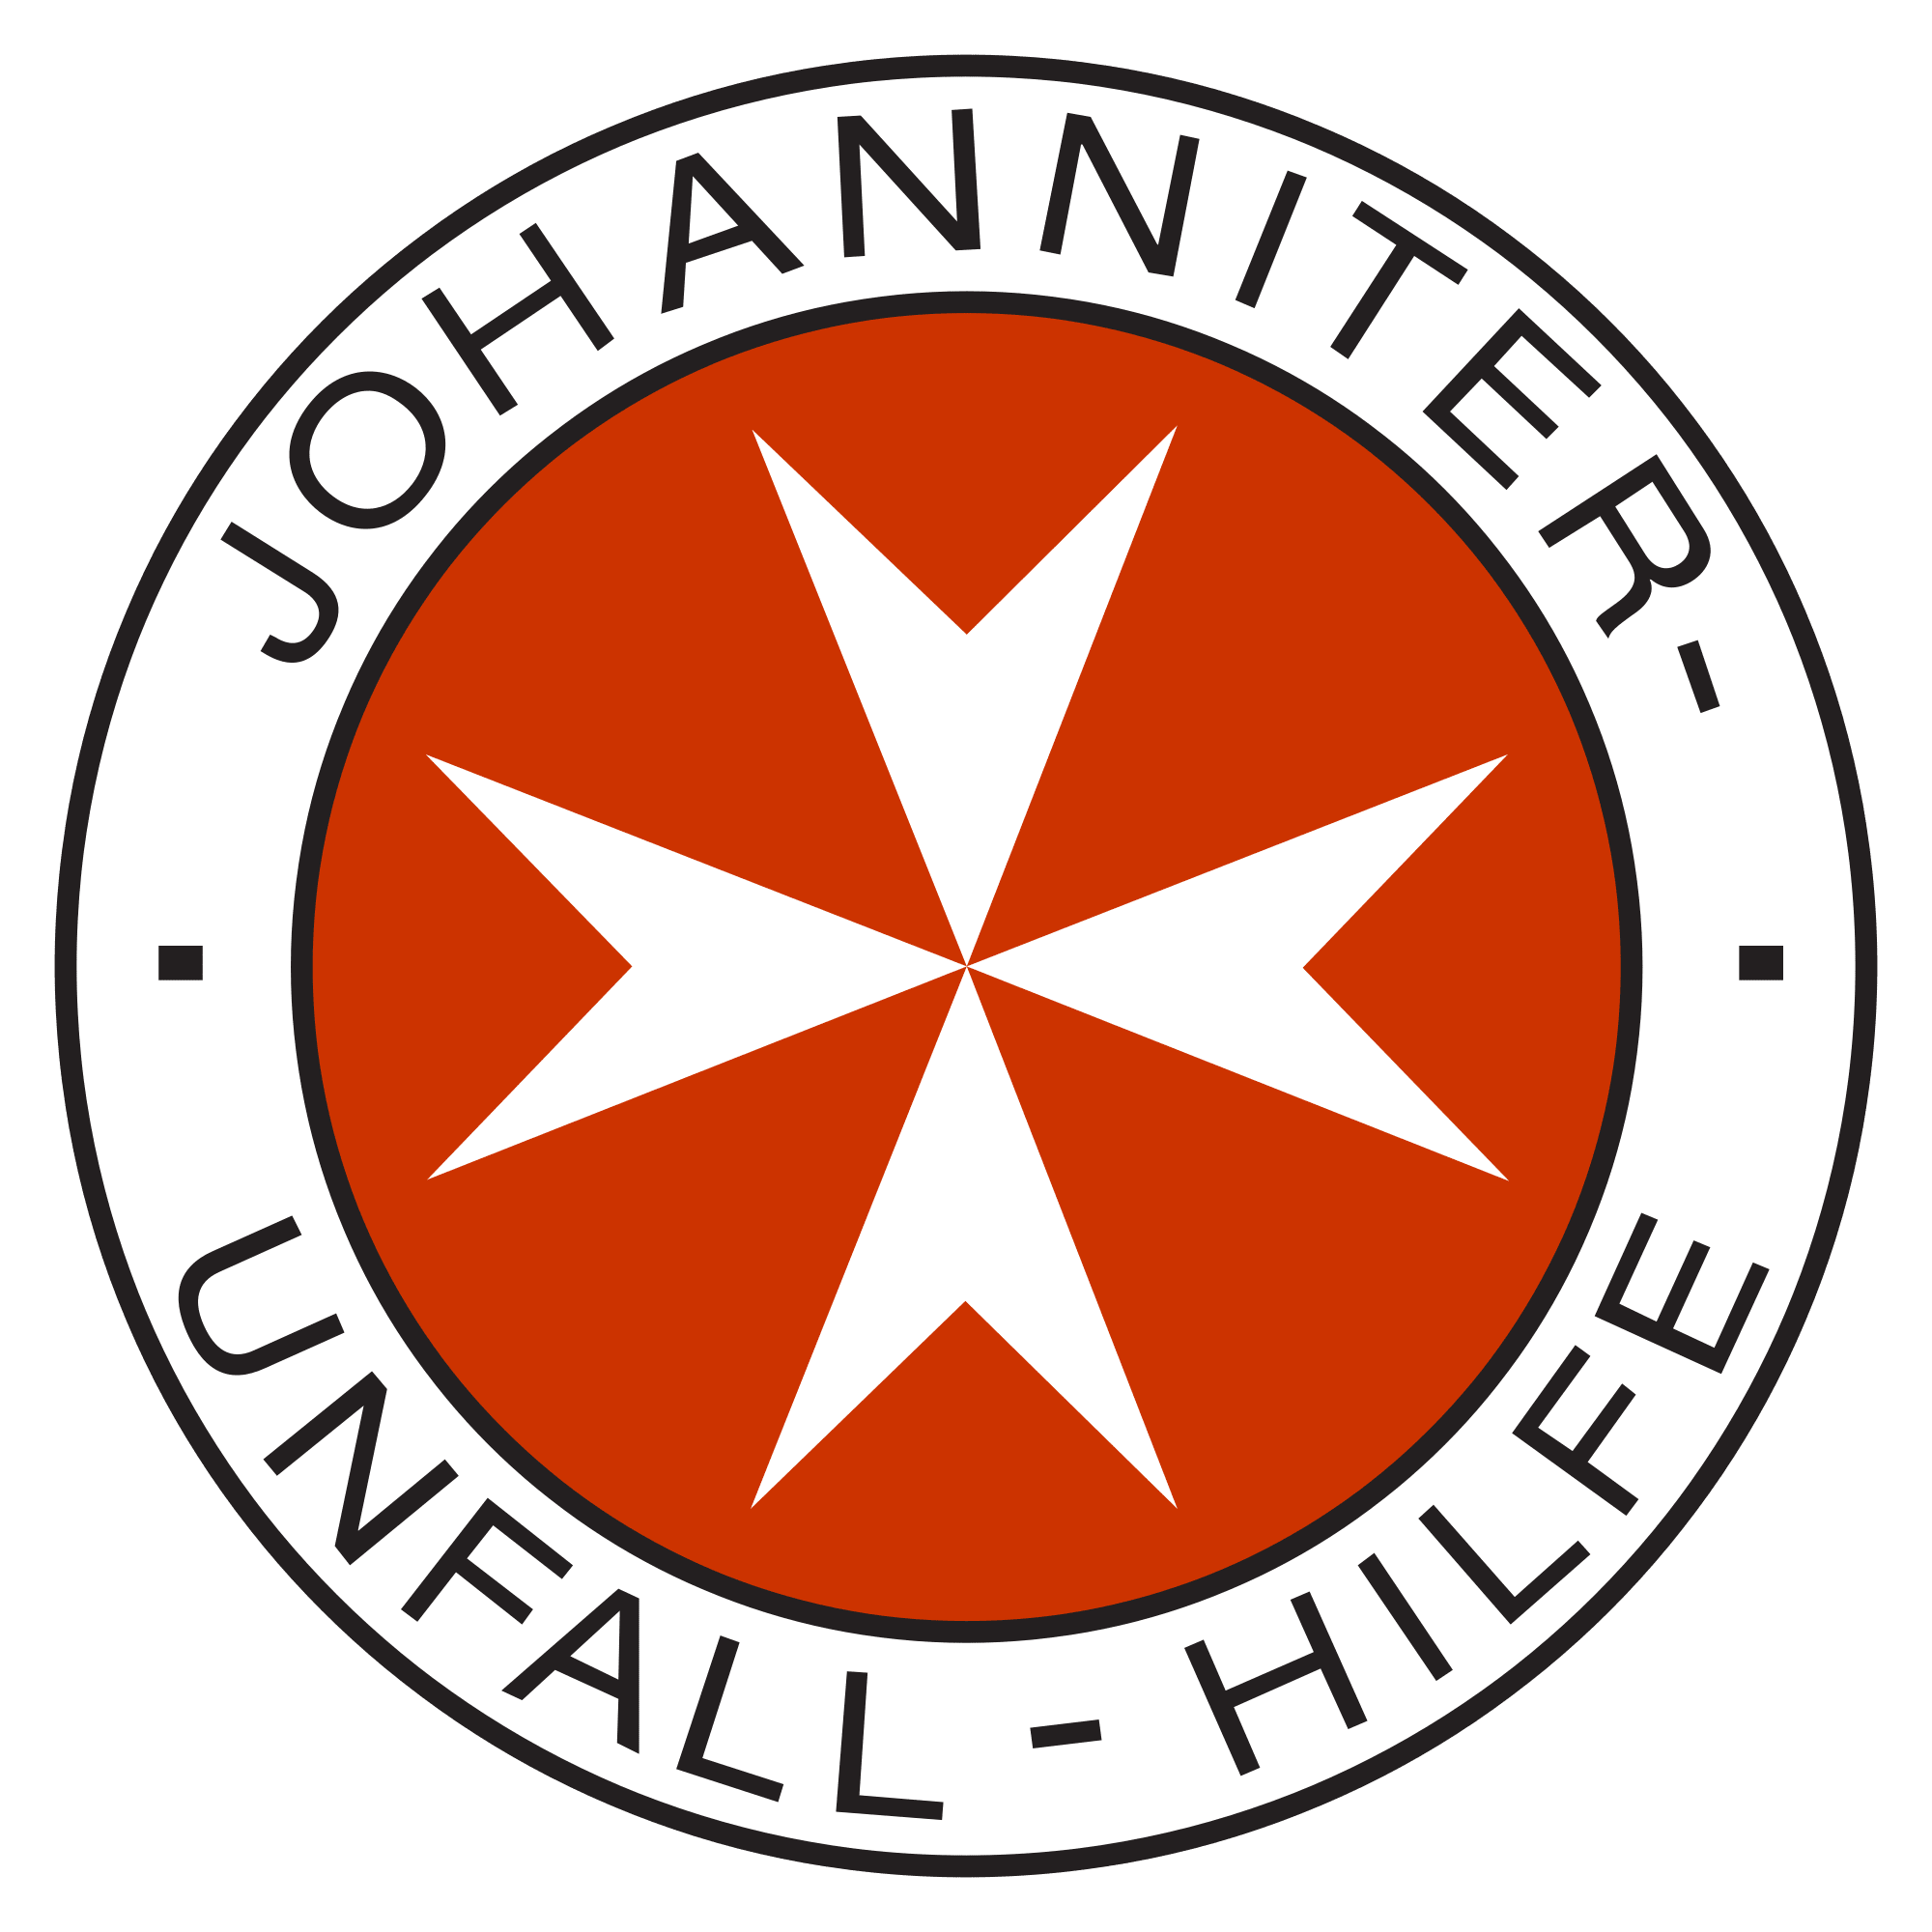 Johanniter Unfallhilfe-logo